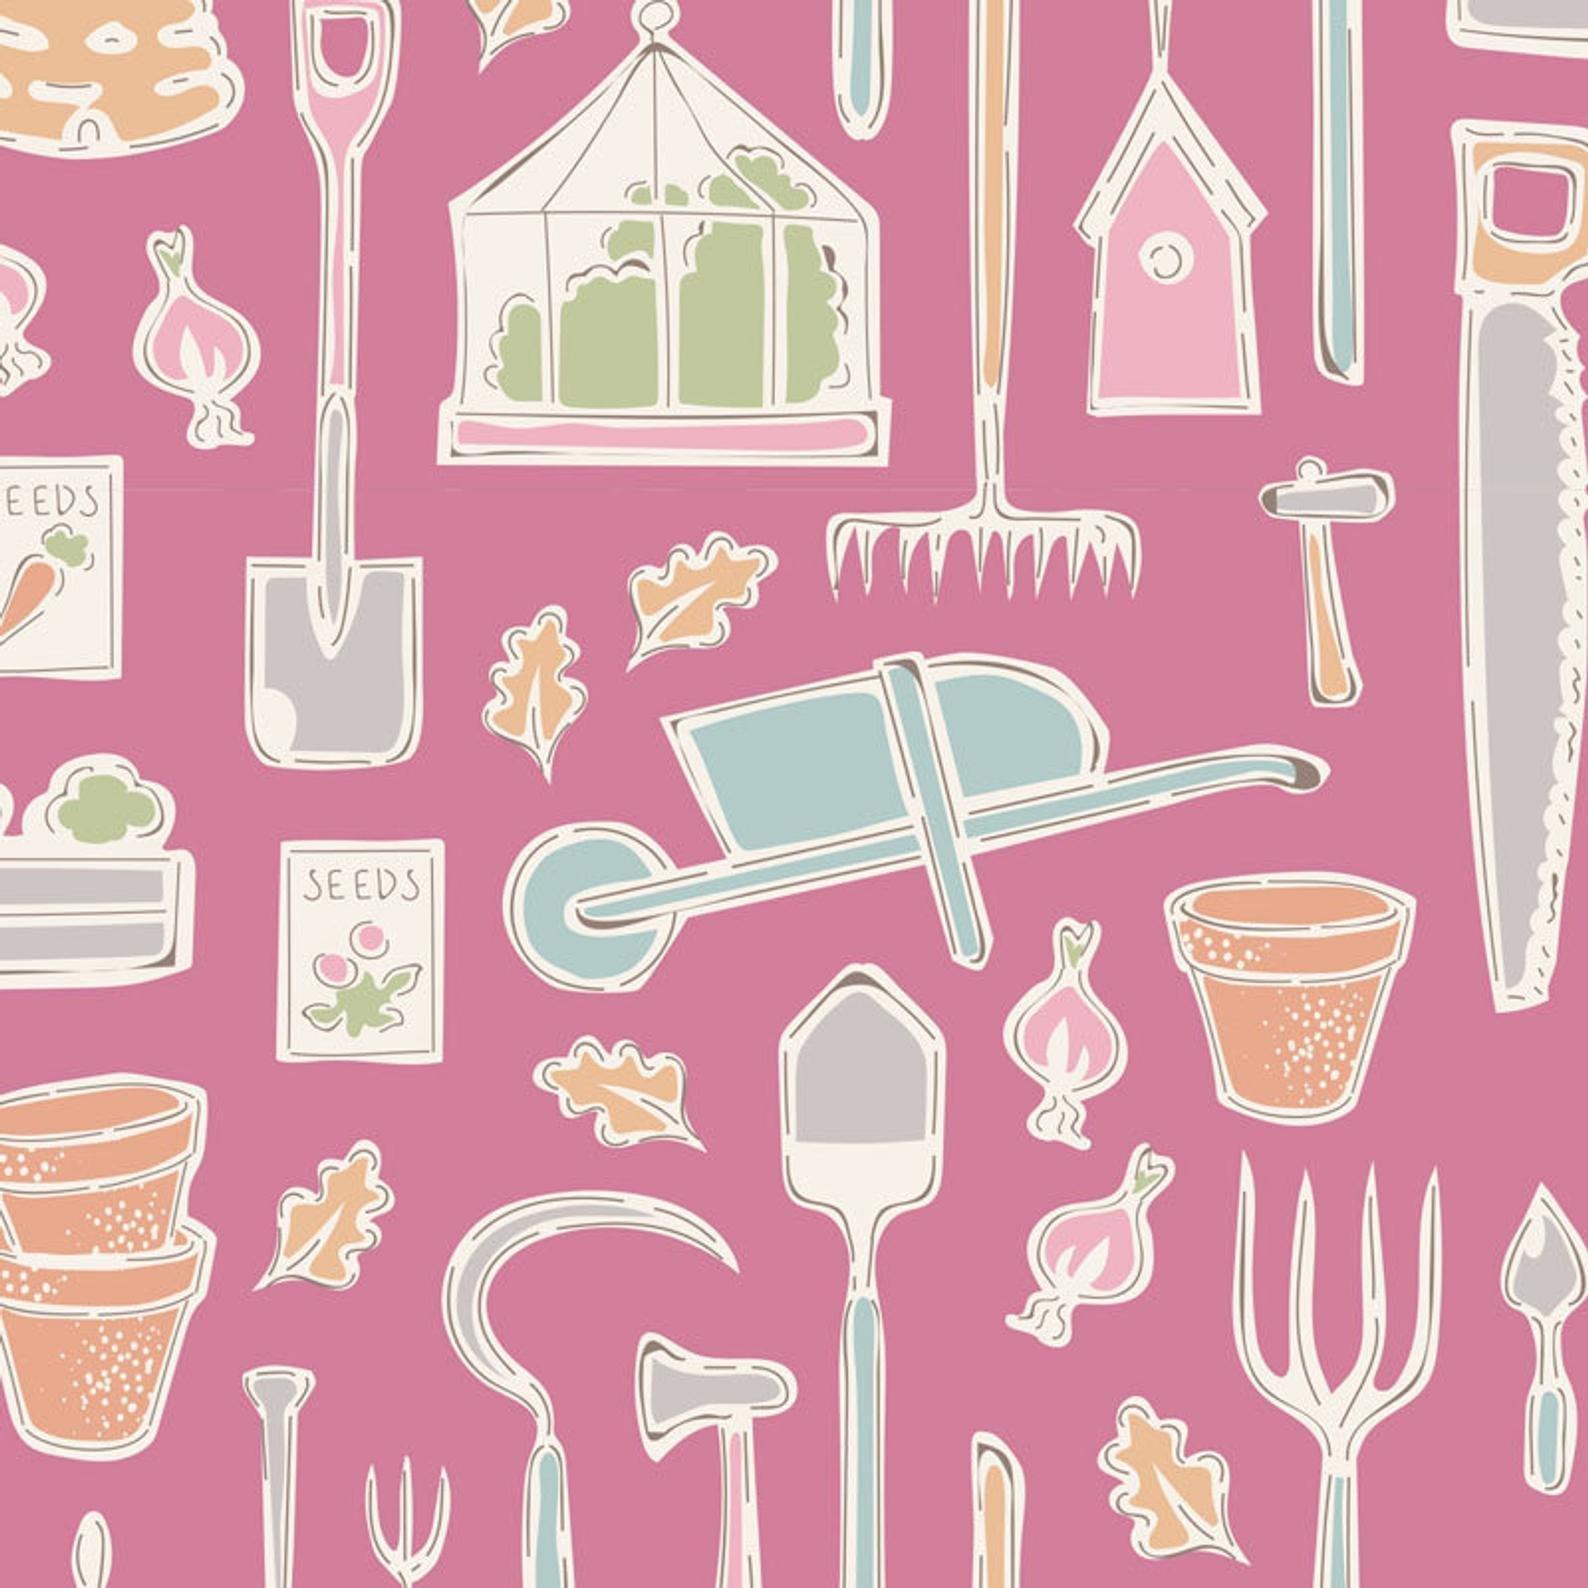 Farm Tools Pink - Tiny Farm